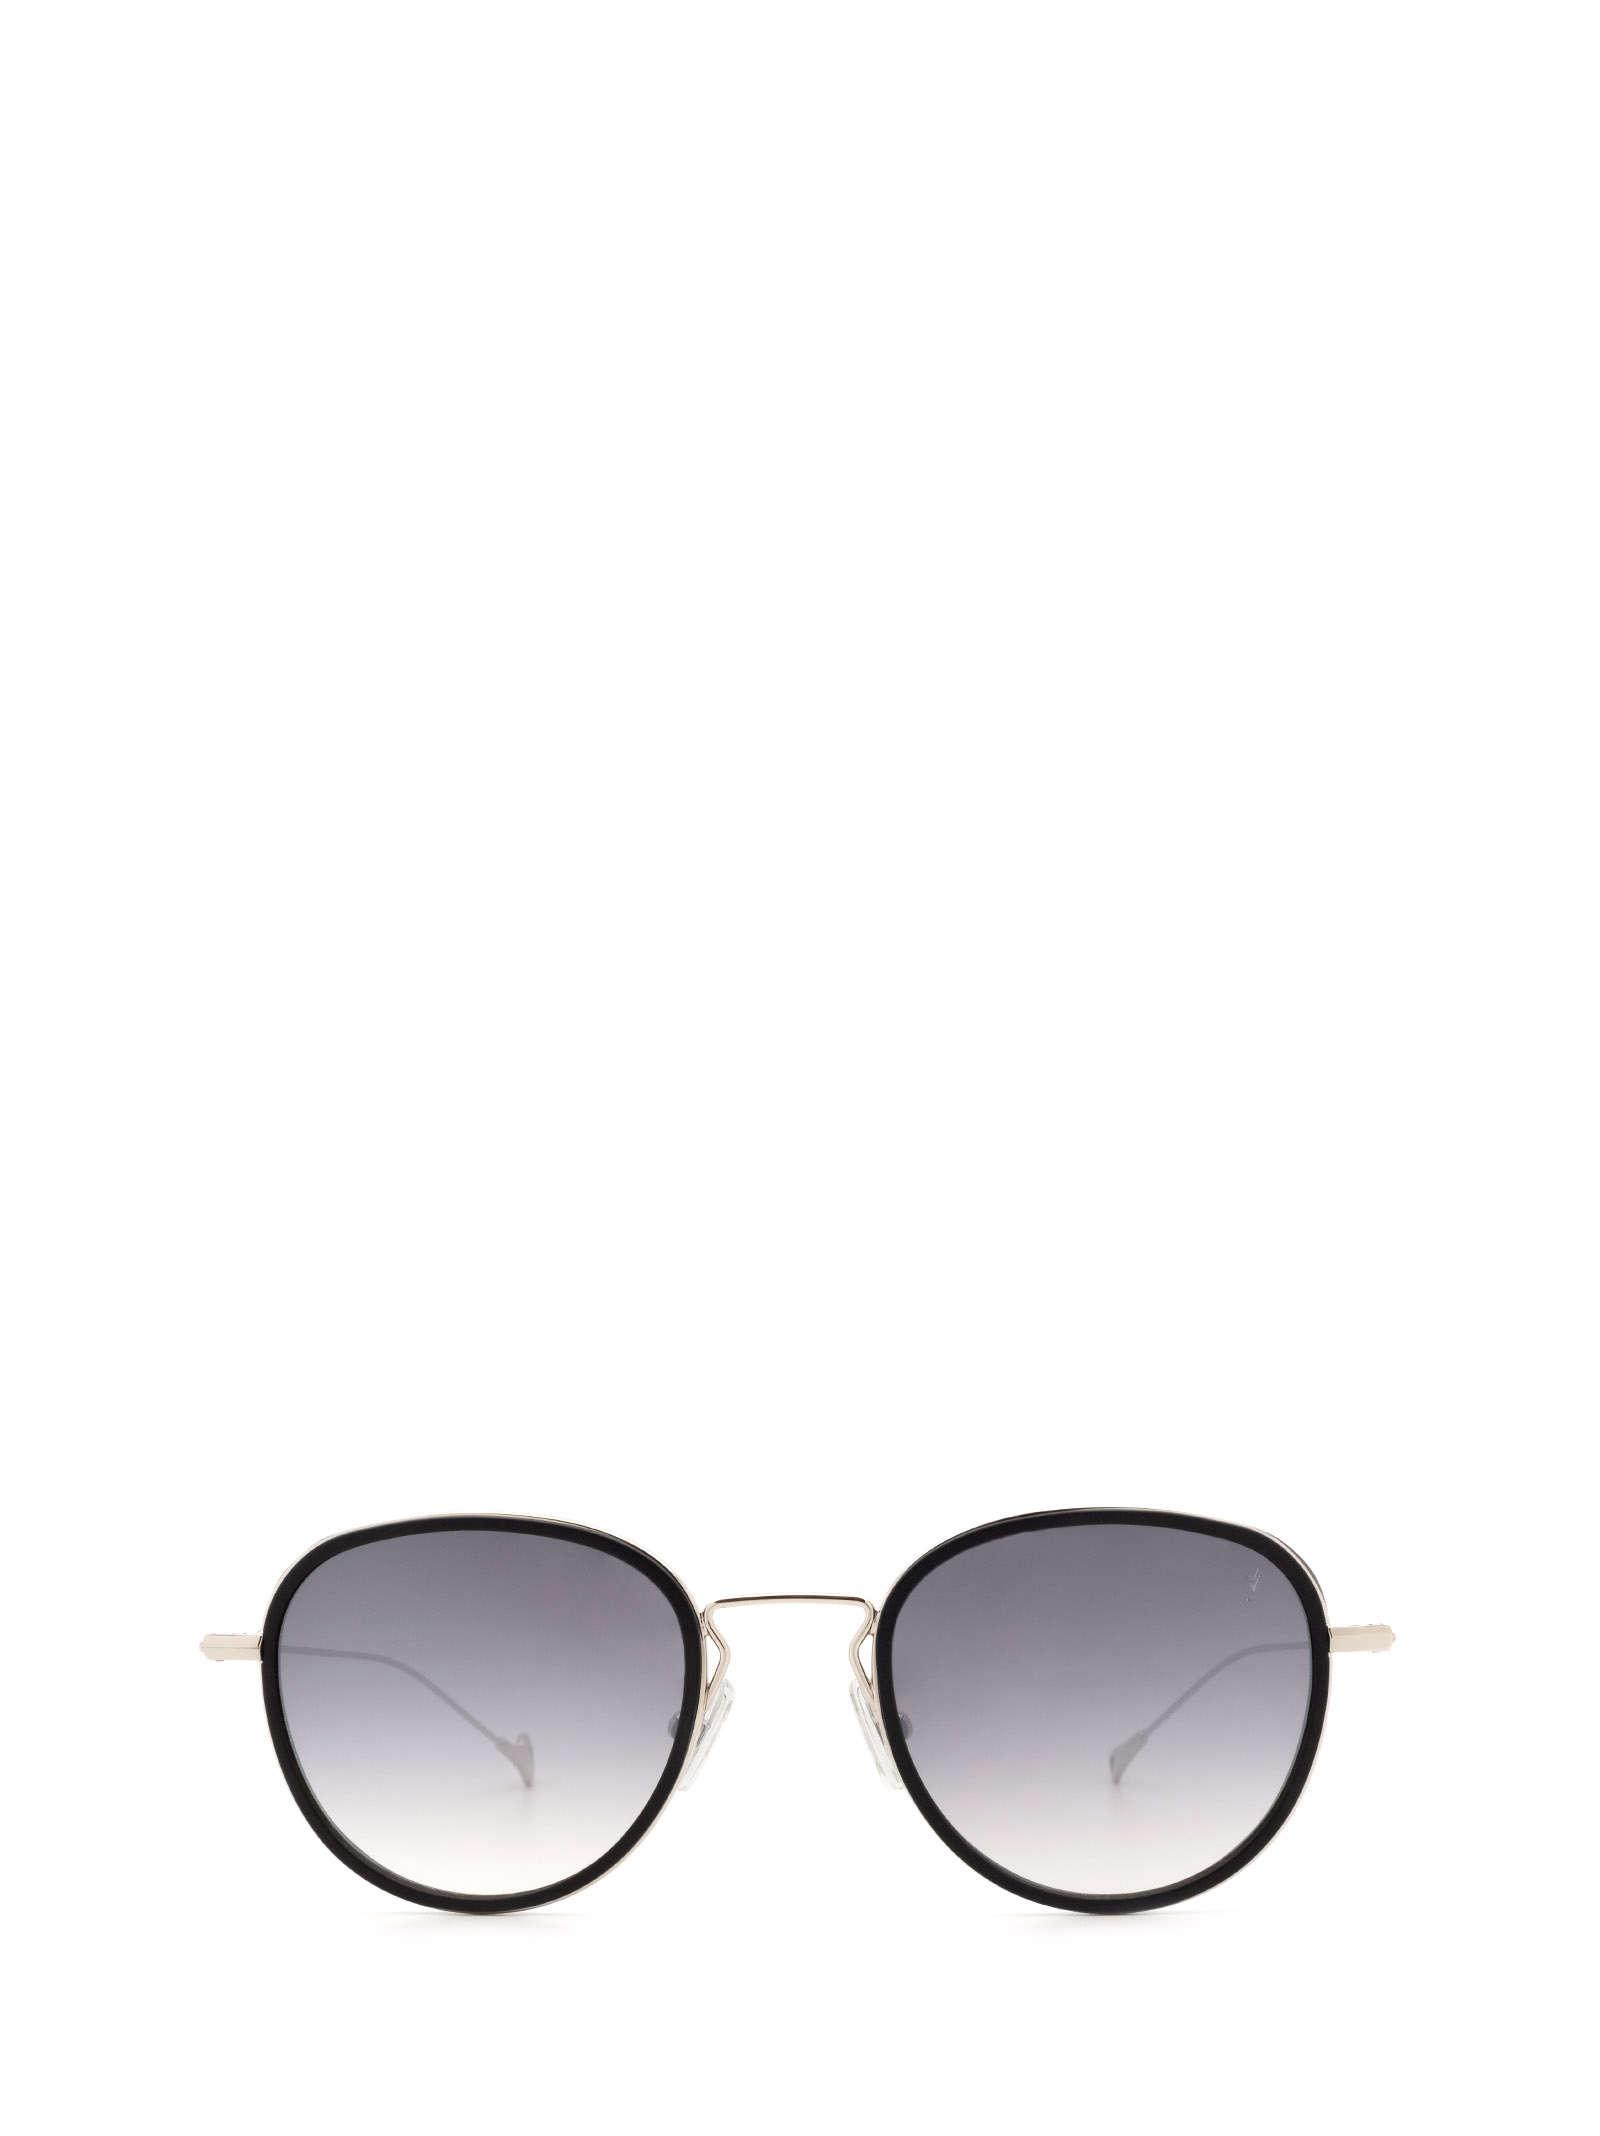 Eyepetizer Eyepetizer Pier Black Sunglasses